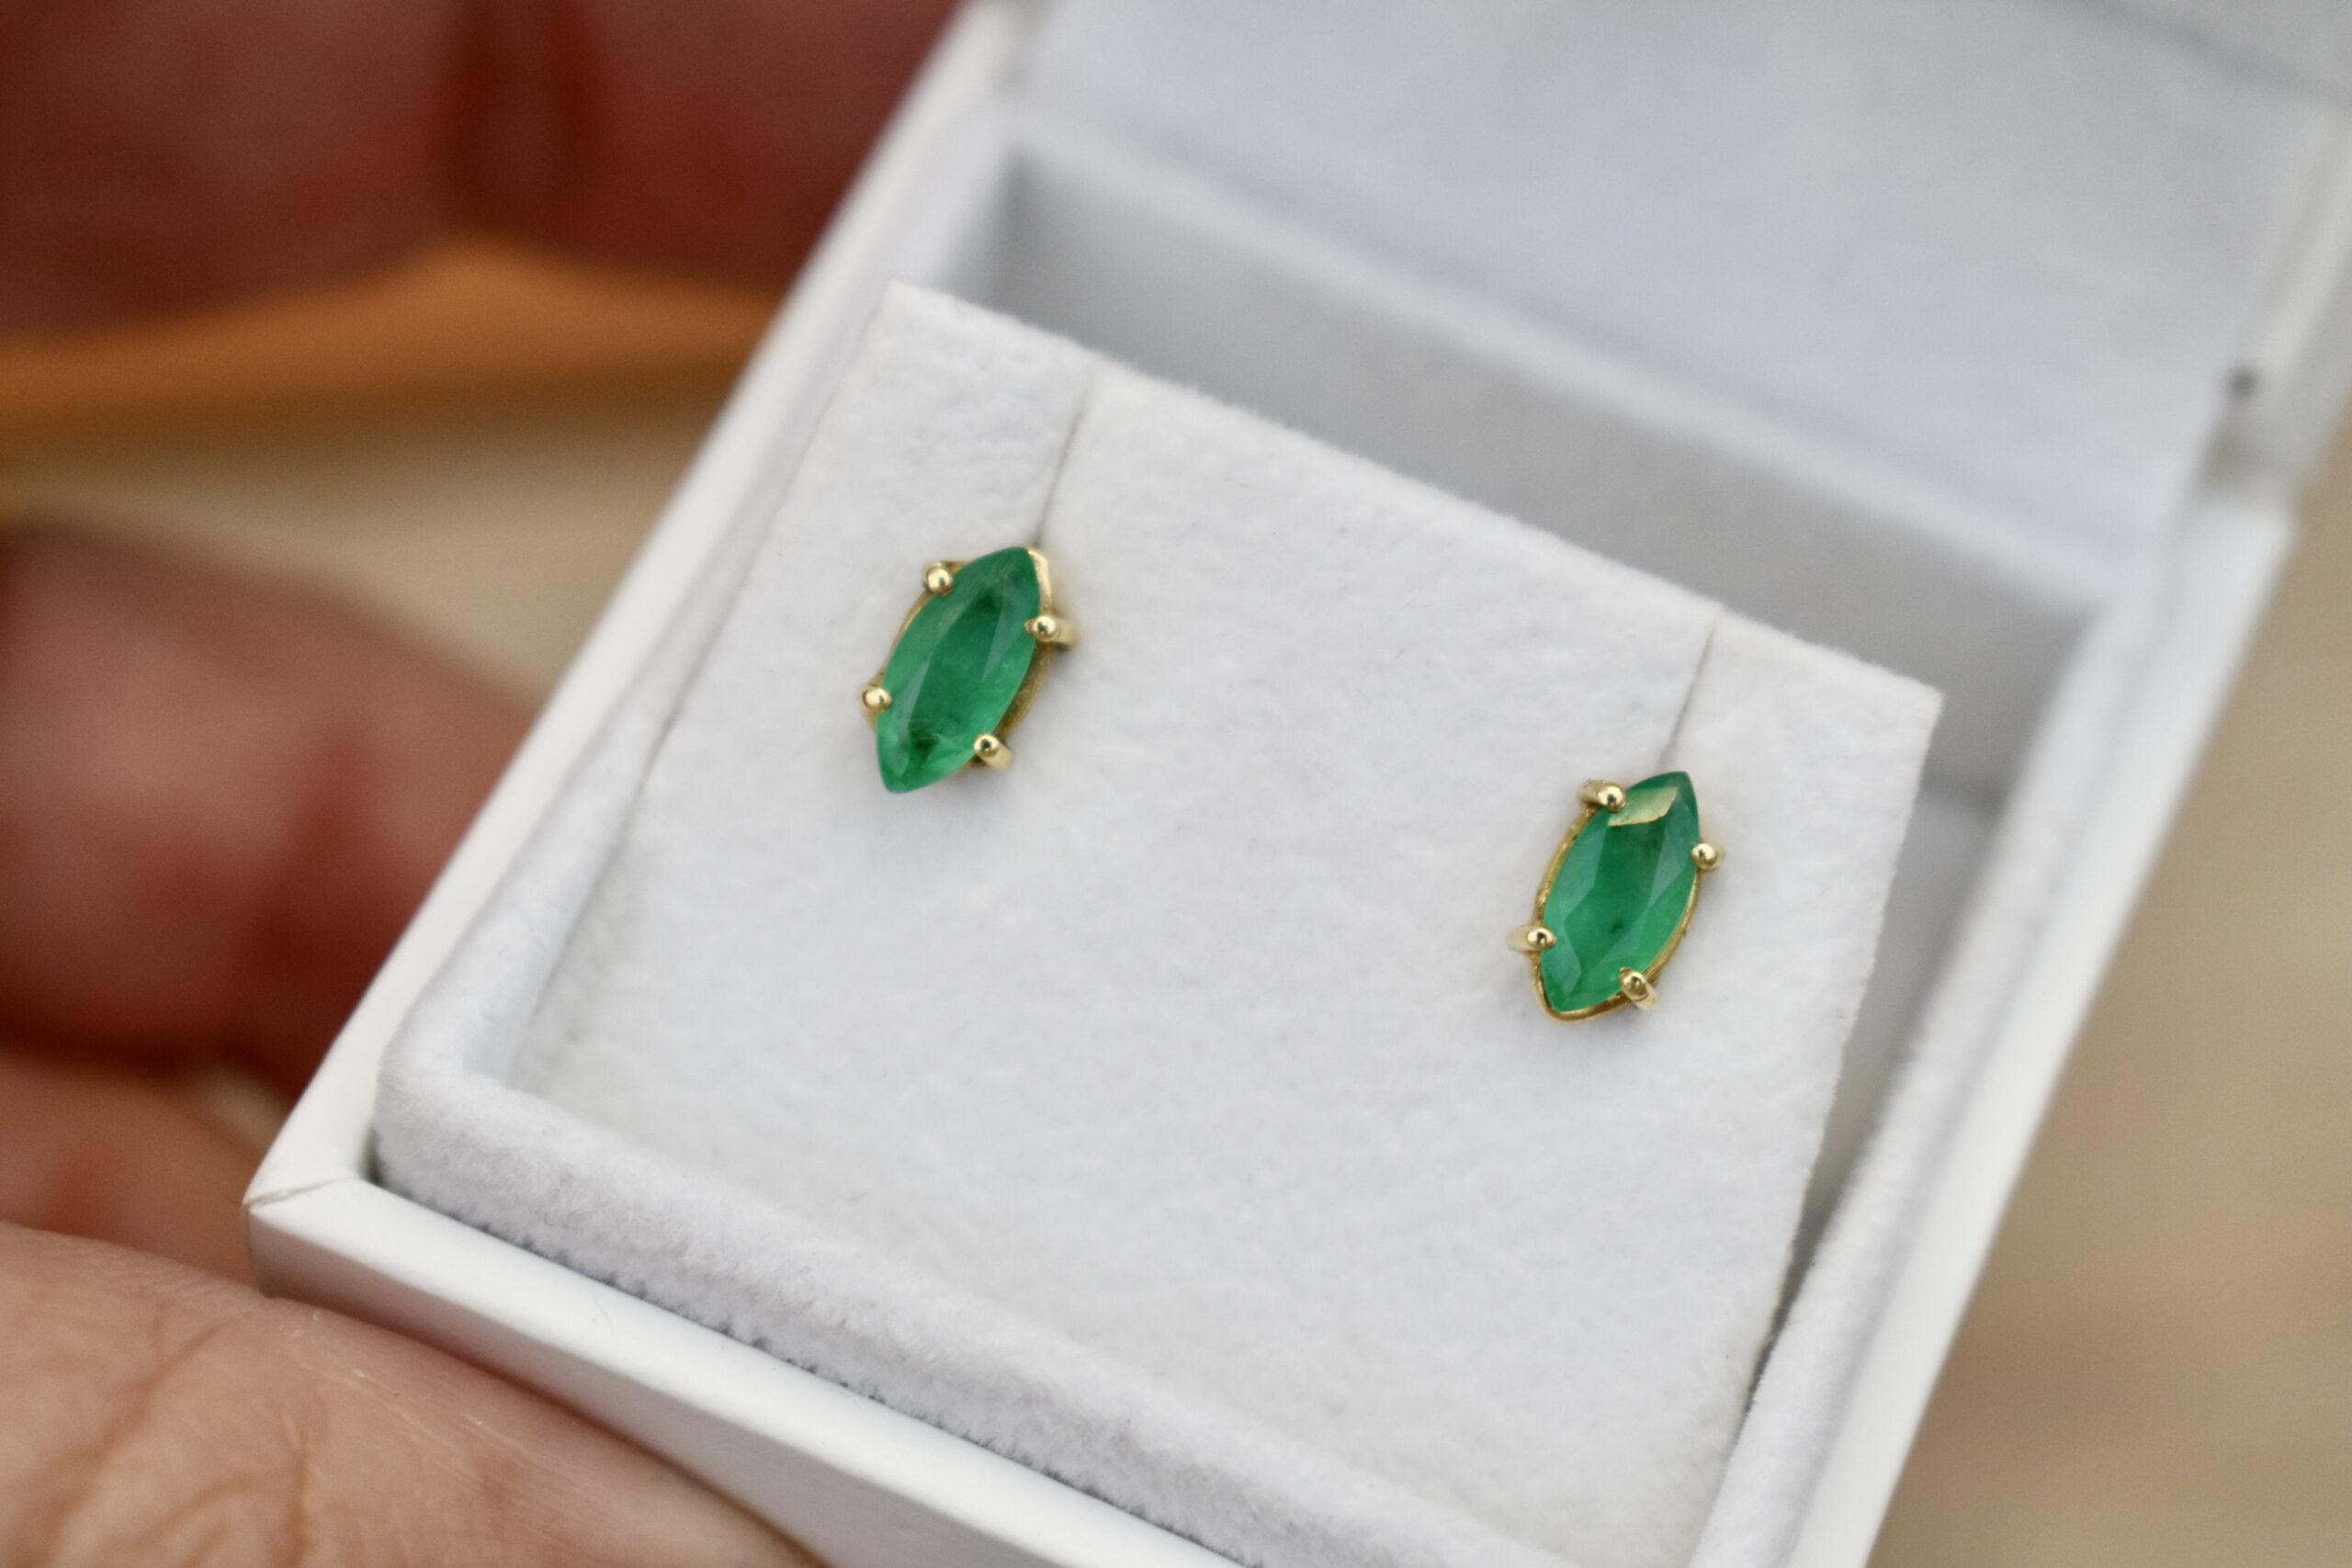 Nico Taeymans AU ob smaragd